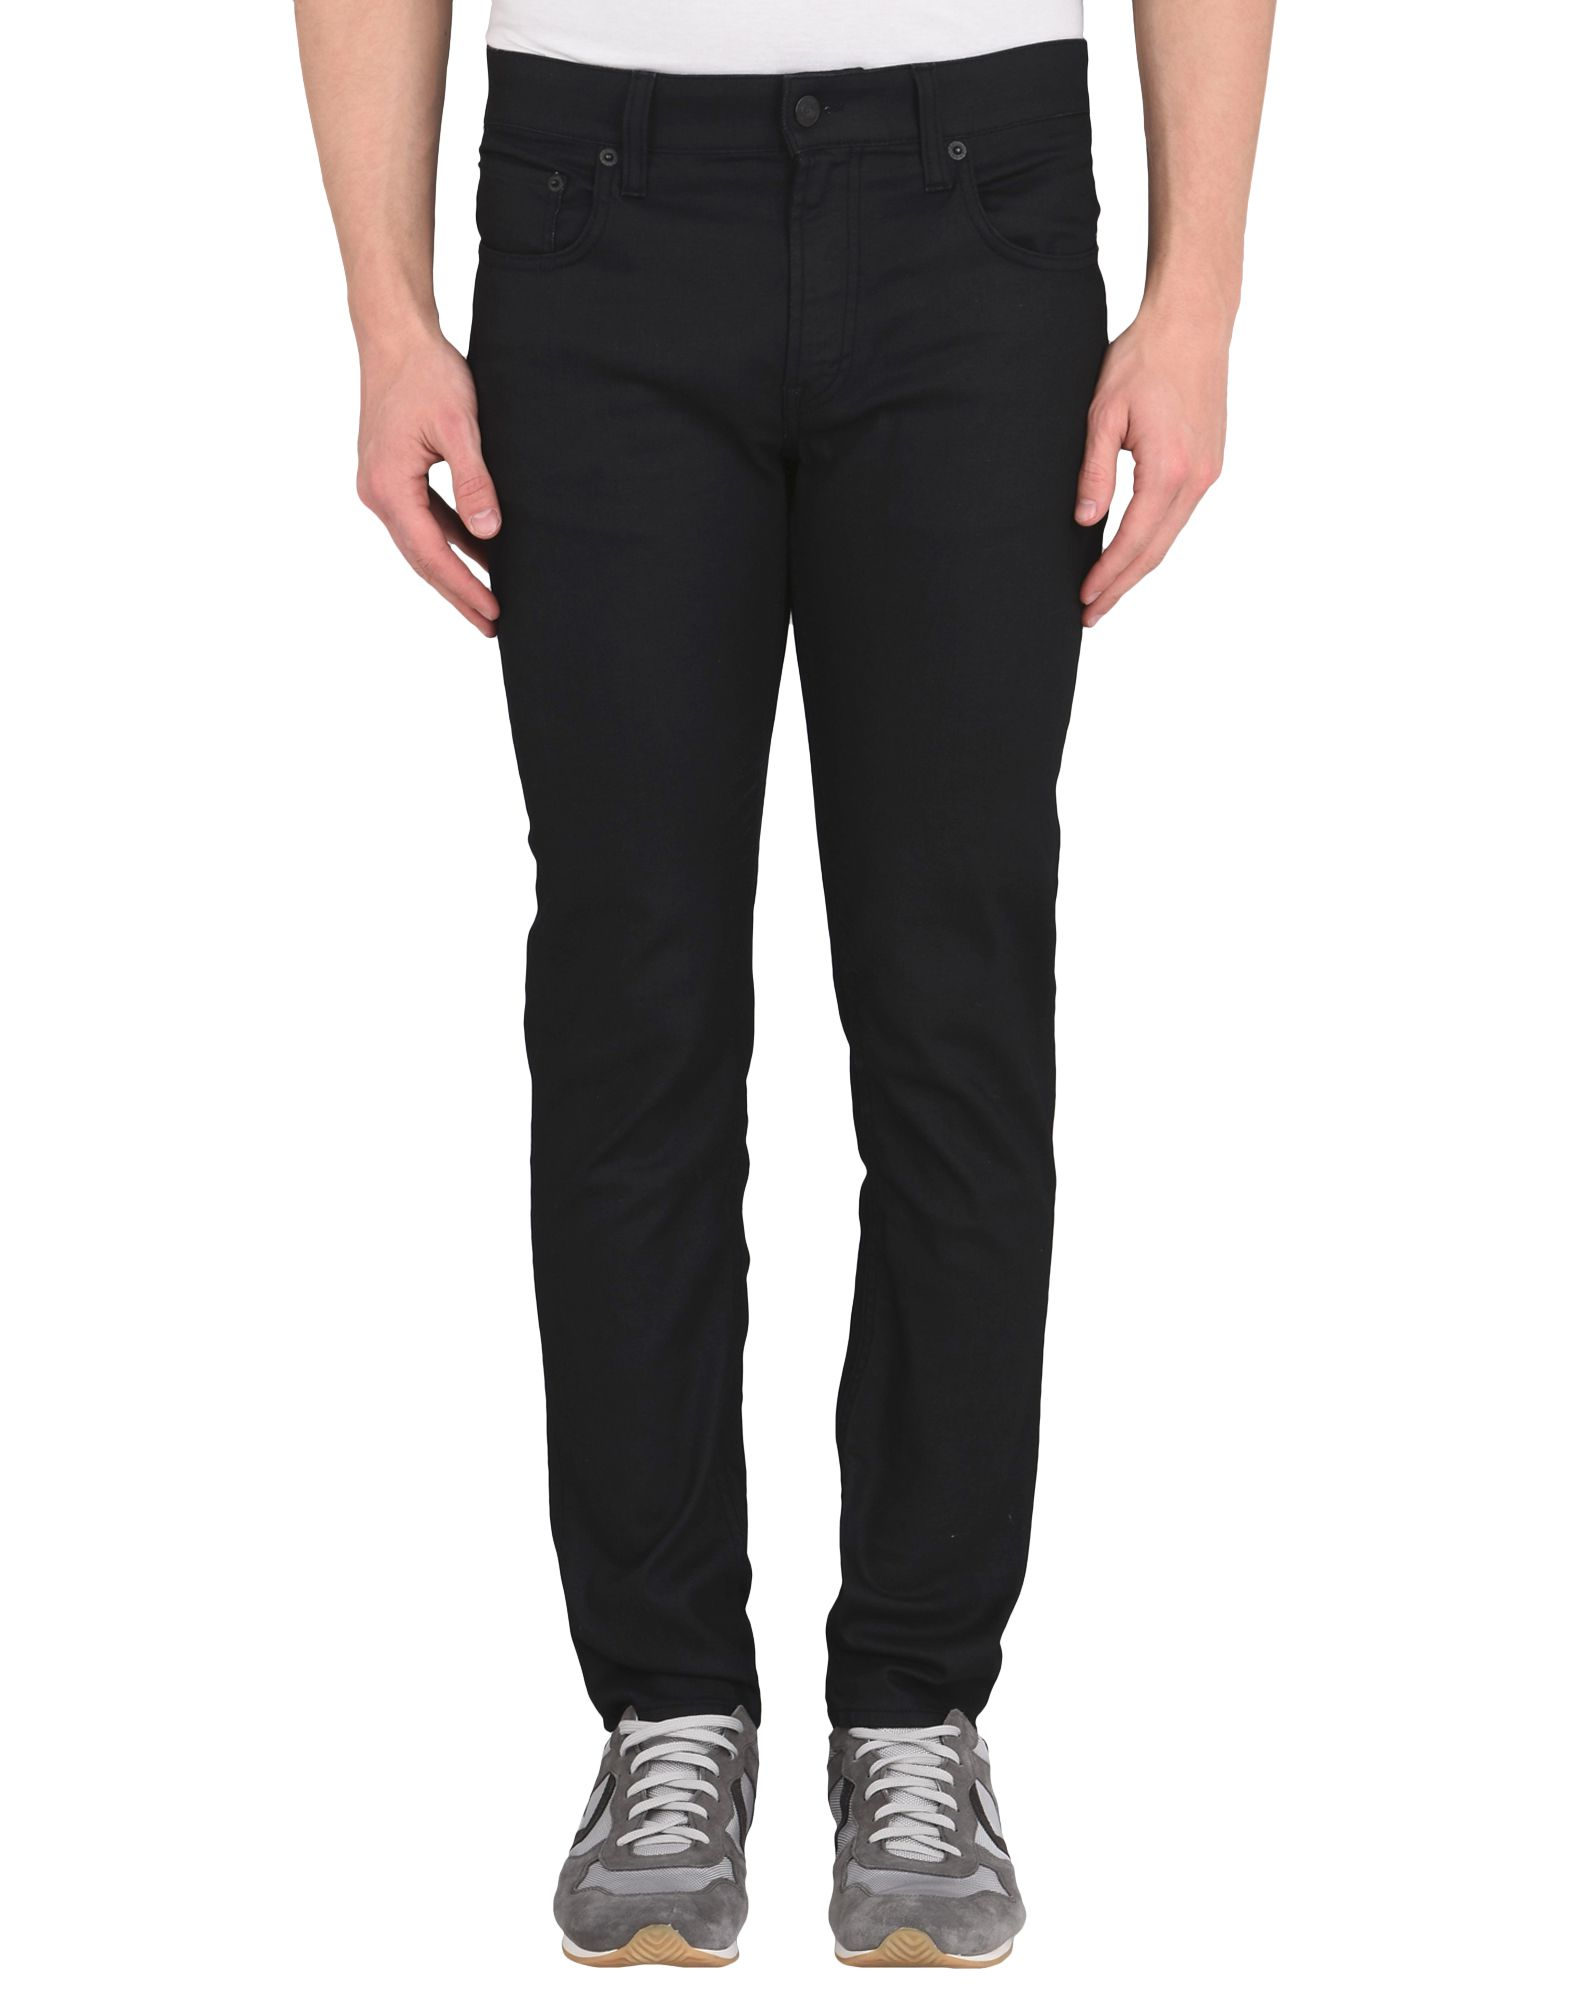 Pantaloni Jeans Department 5 Pantalone Skeith - Donna - Acquista online su